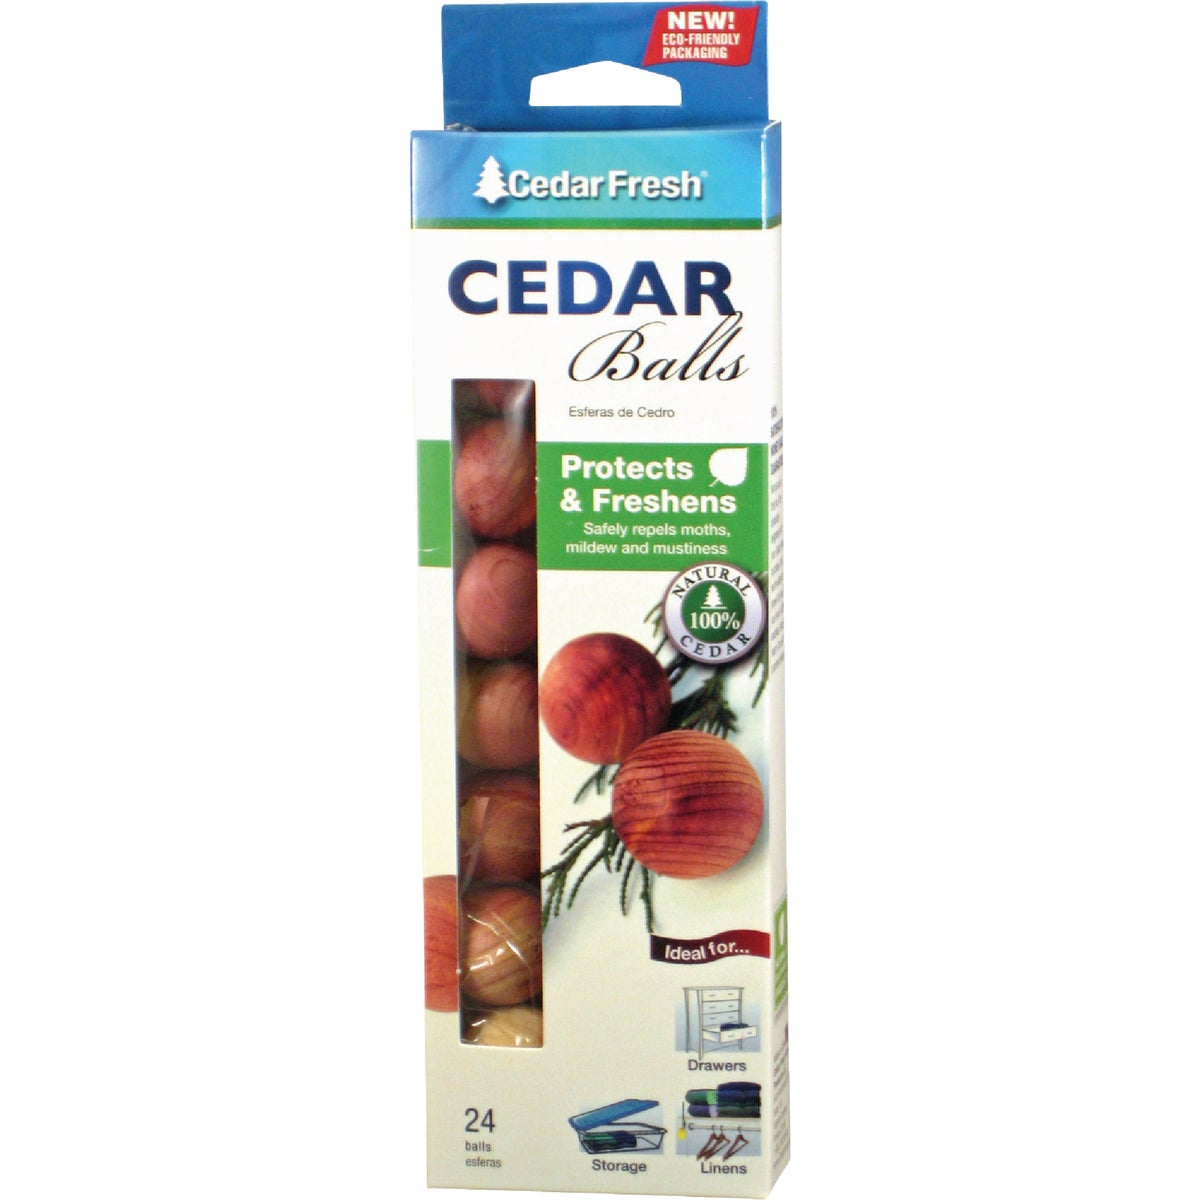 Cedar Fresh Cedar Balls